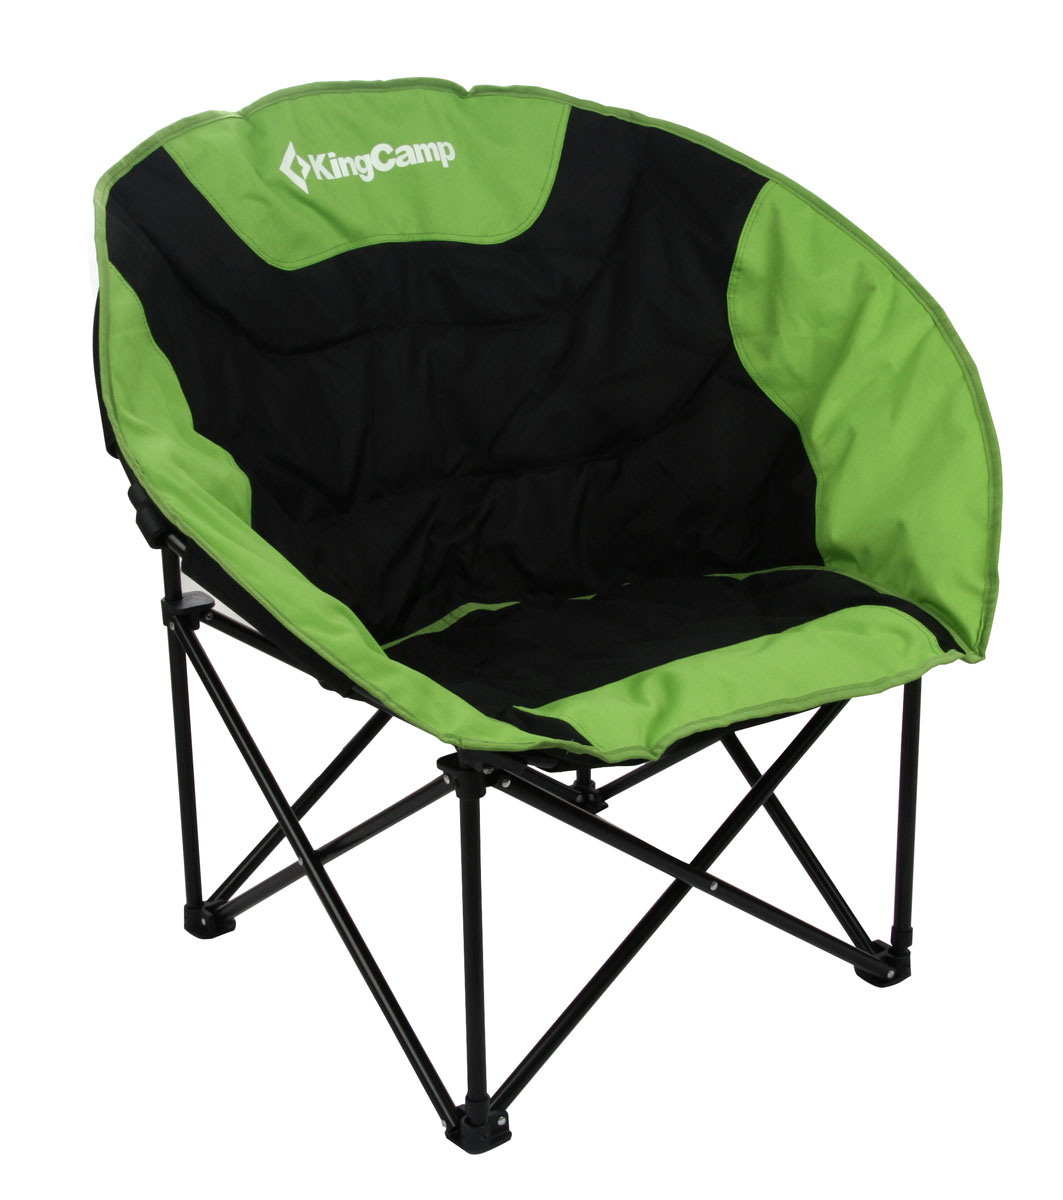 Кресло складное KingCamp Moon Leisure Chair, цвет: зеленый кресло складное kingcamp director delux kc3811 цвет черно серый